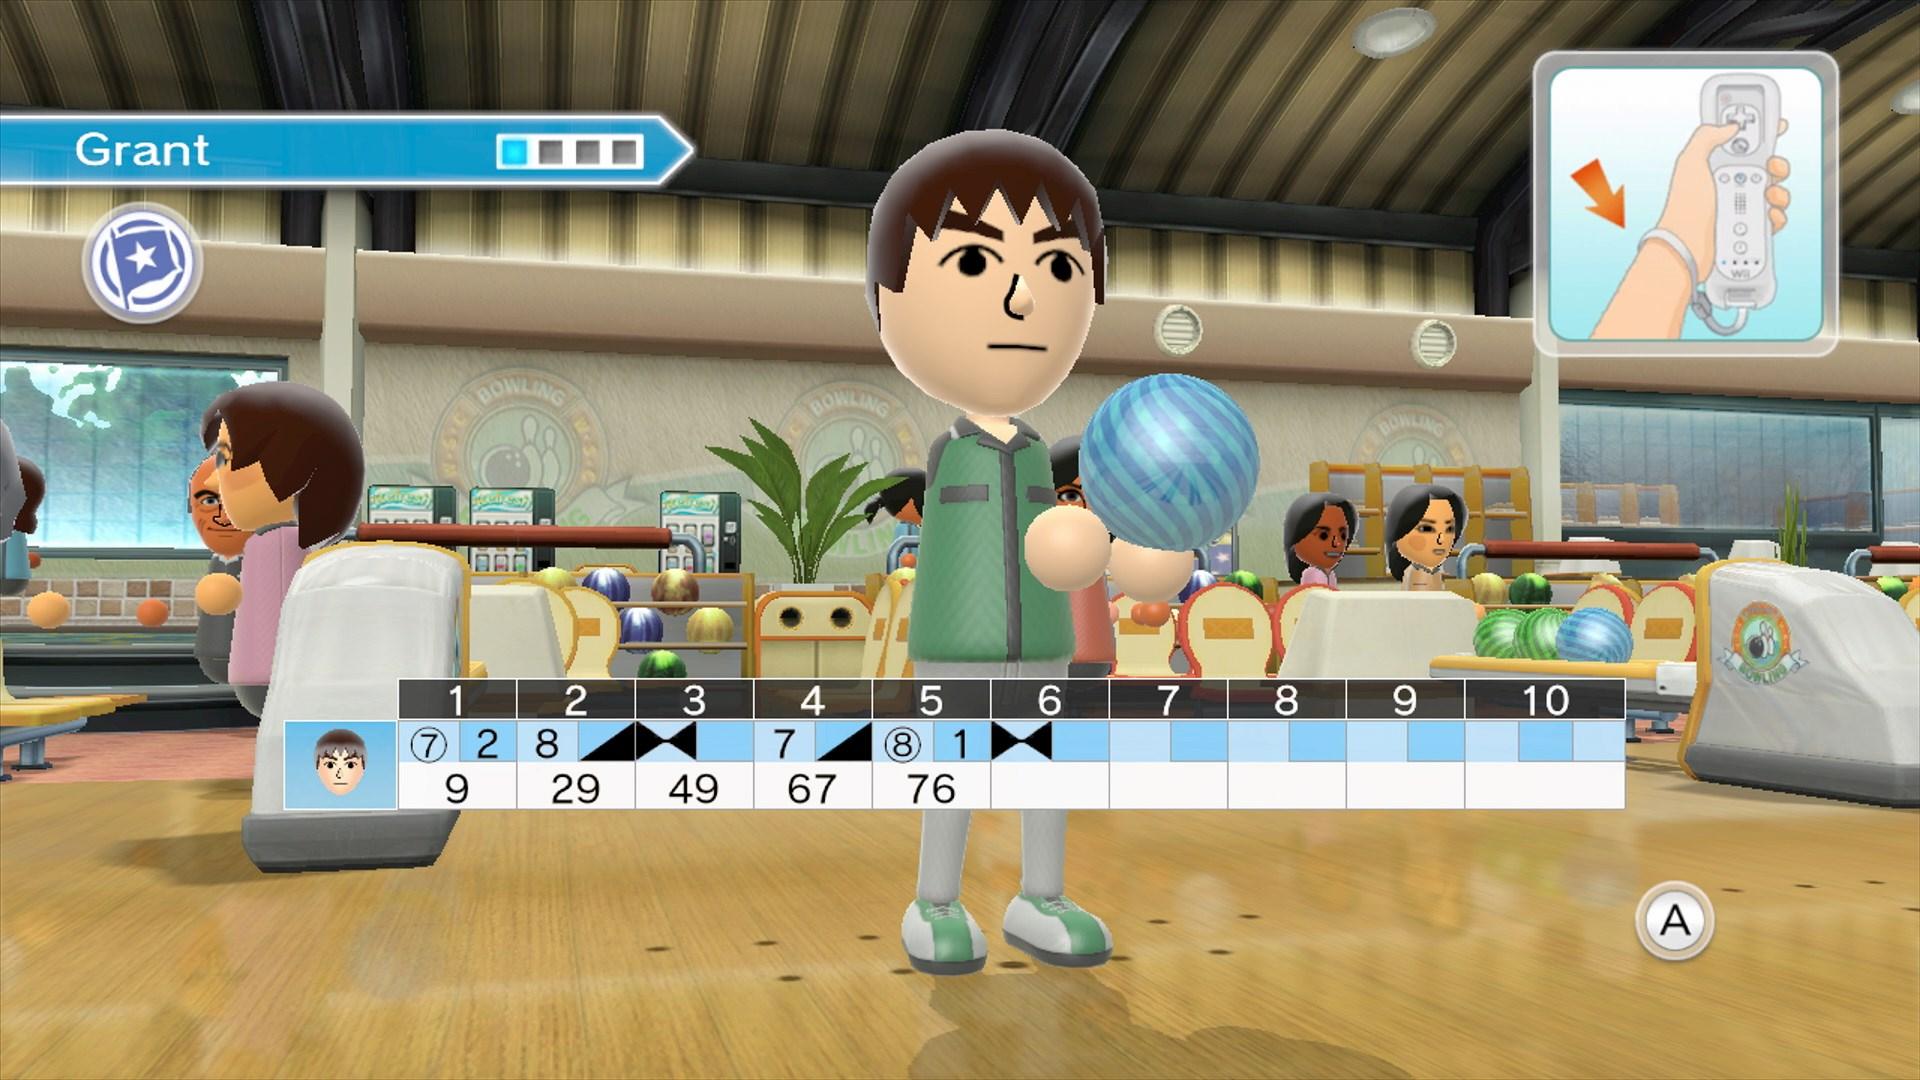 wiiu_wiisportsclub_bowling_scrn01